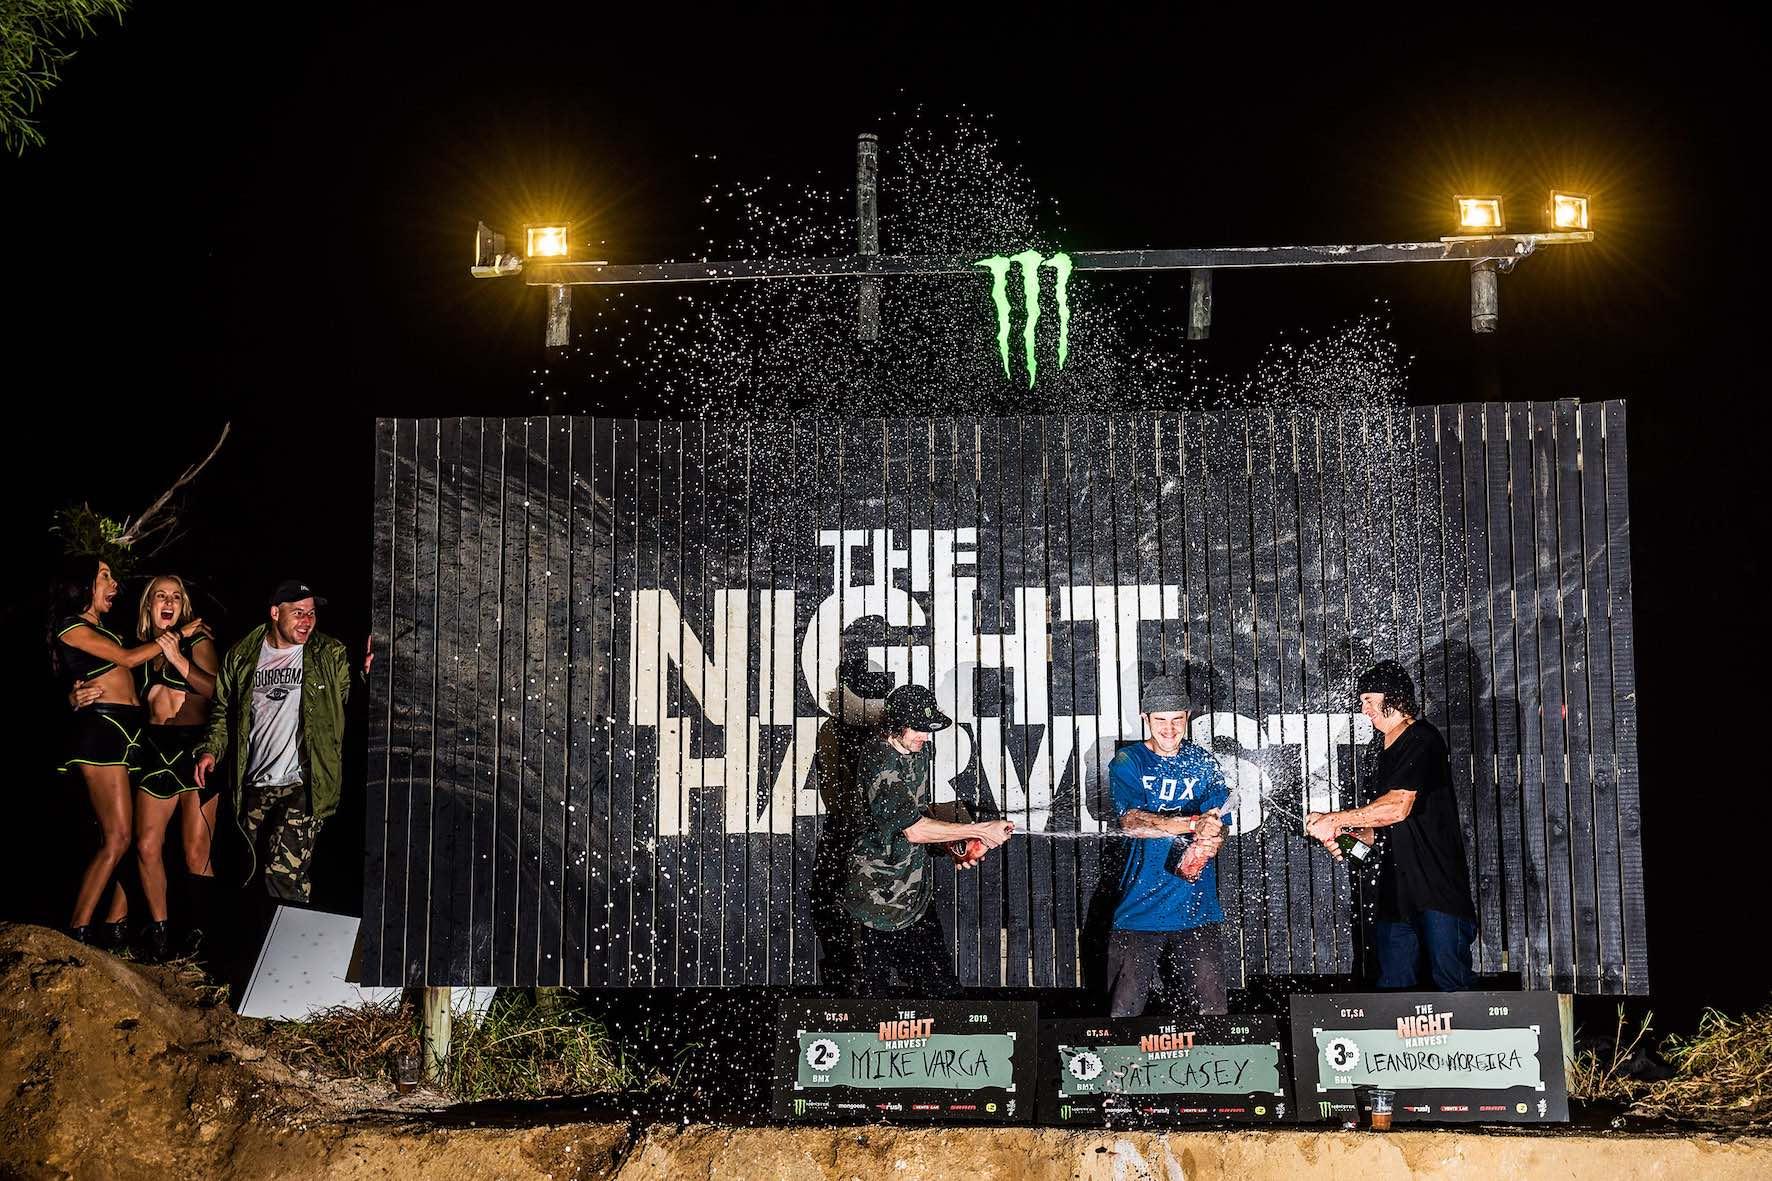 The Night Harvest 2019 BMX podium